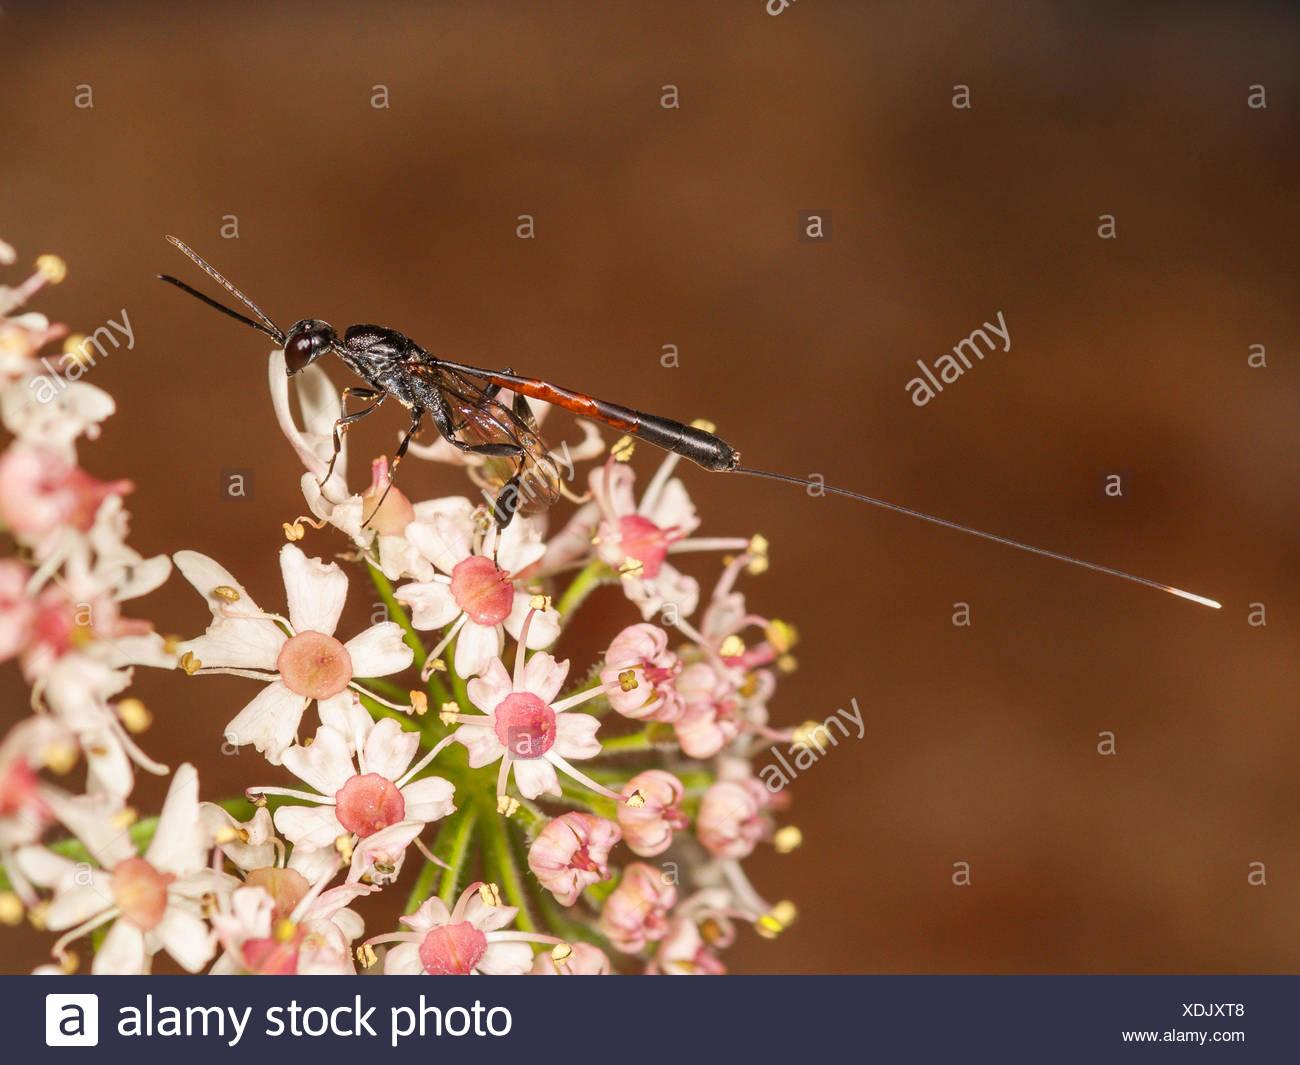 Gasteruptiid wasp (Gasteruption jaculator), female foraging on Common Hogweed (Heracleum sphondylium), Germany Stock Photo